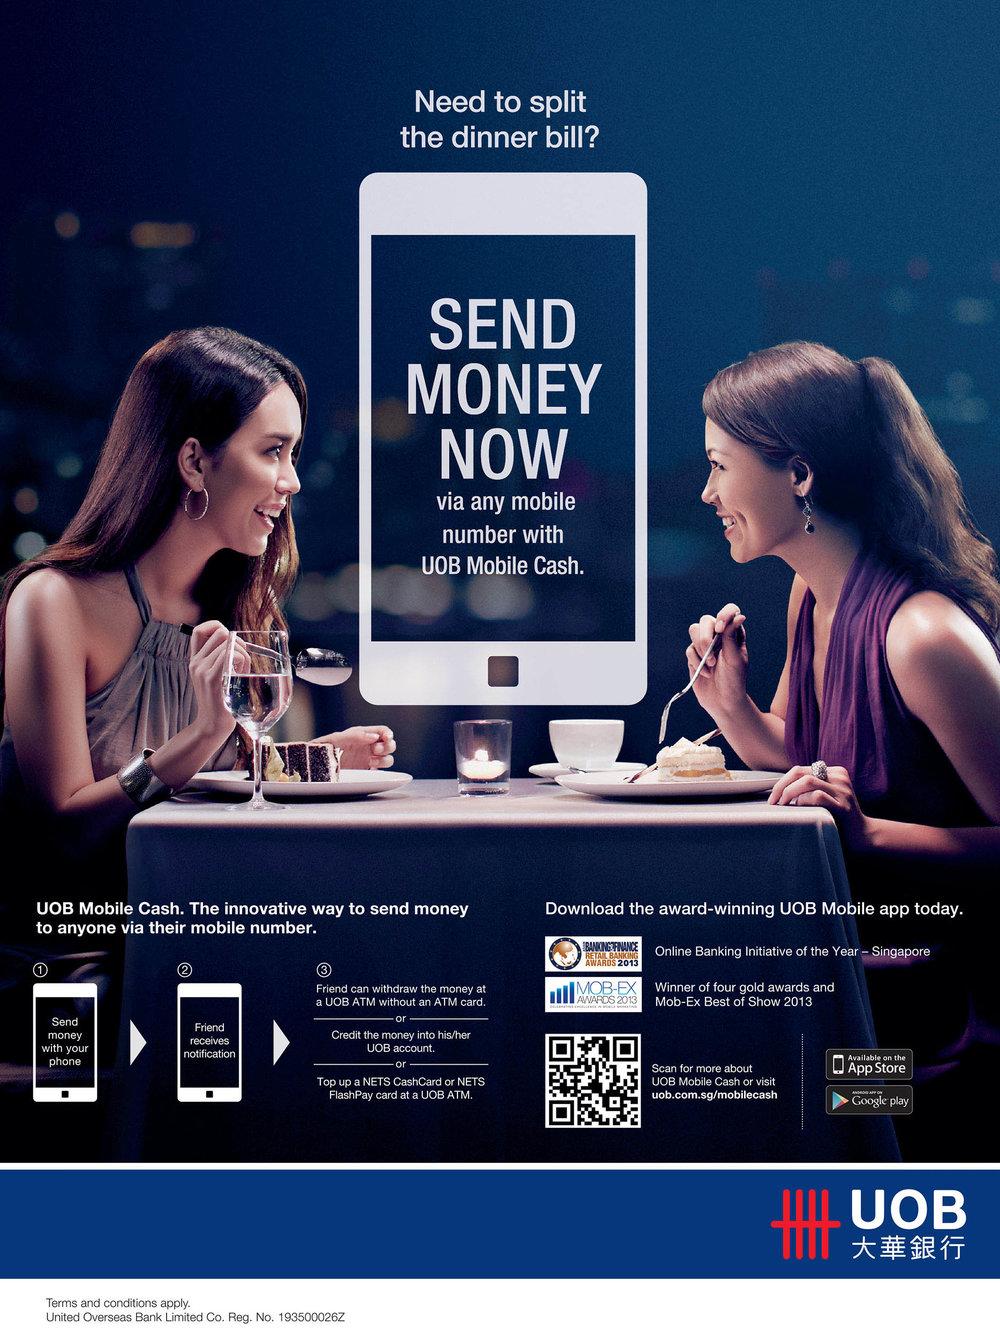 UOB_Mobile Cash.jpg